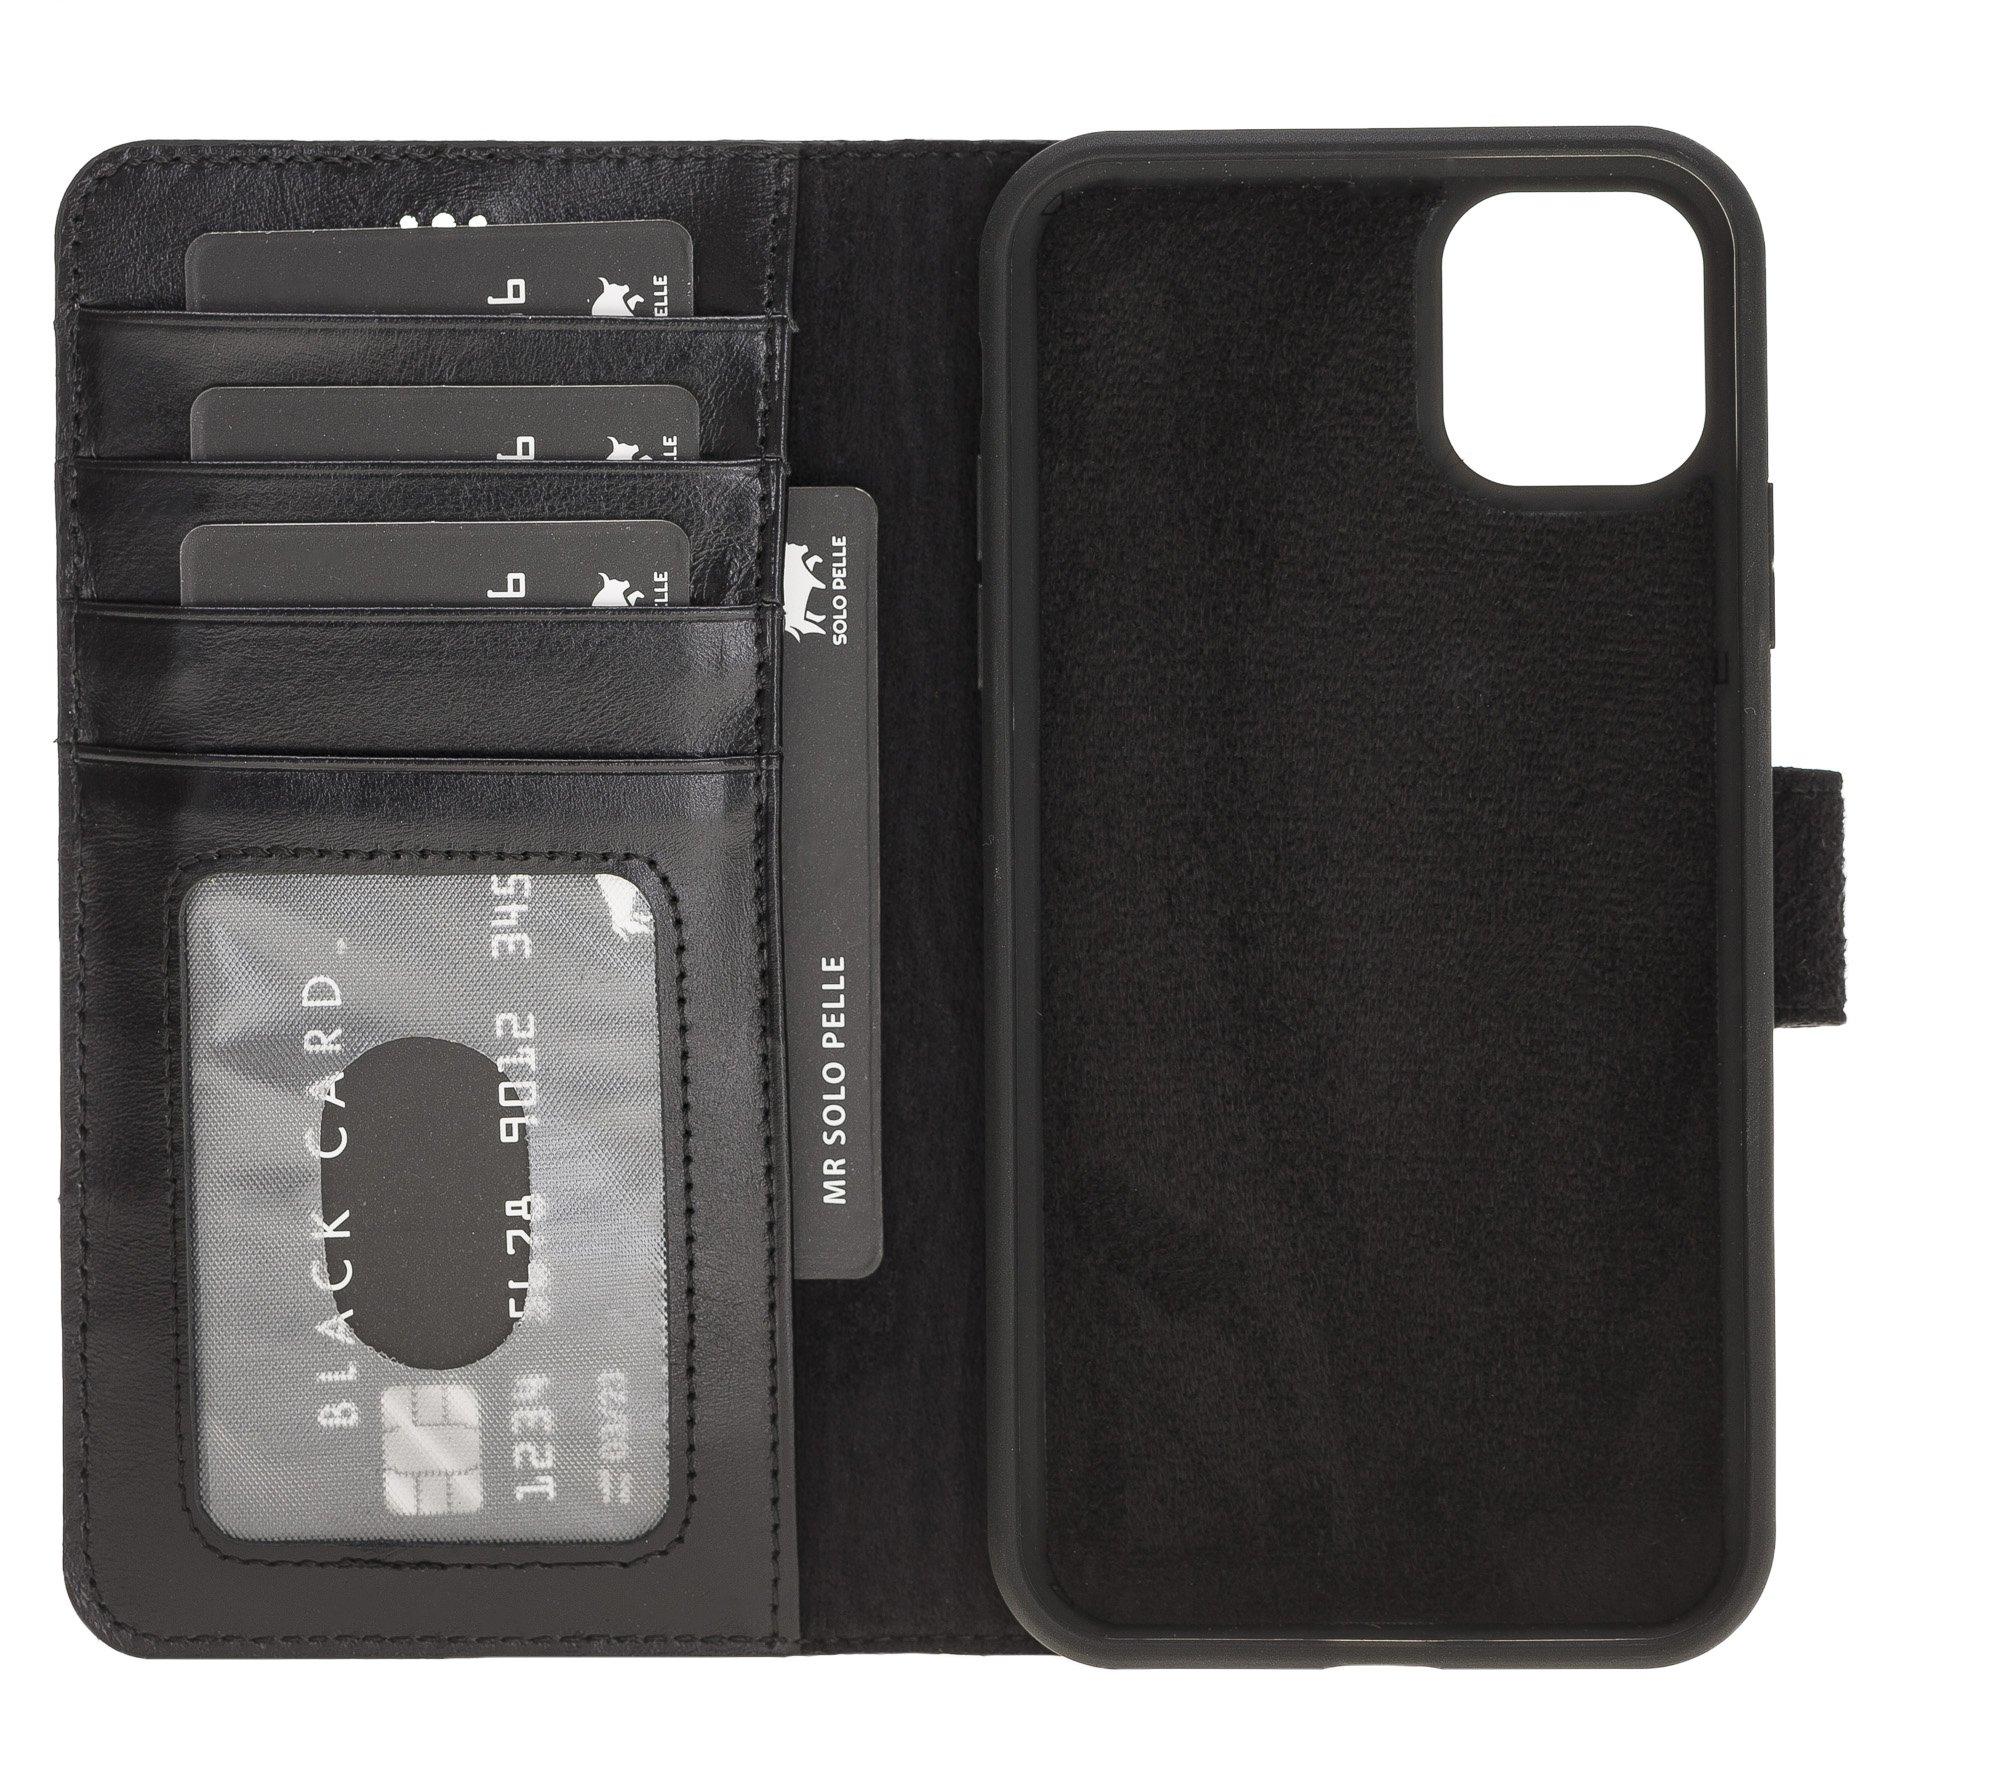 Solo Pelle Lederhülle kompatibel für iPhone 11 in 6.1 Zoll abnehmbare Hülle (2in1) inkl. Kartenfächer für das original Apple iPhone 11 (Schwarz)